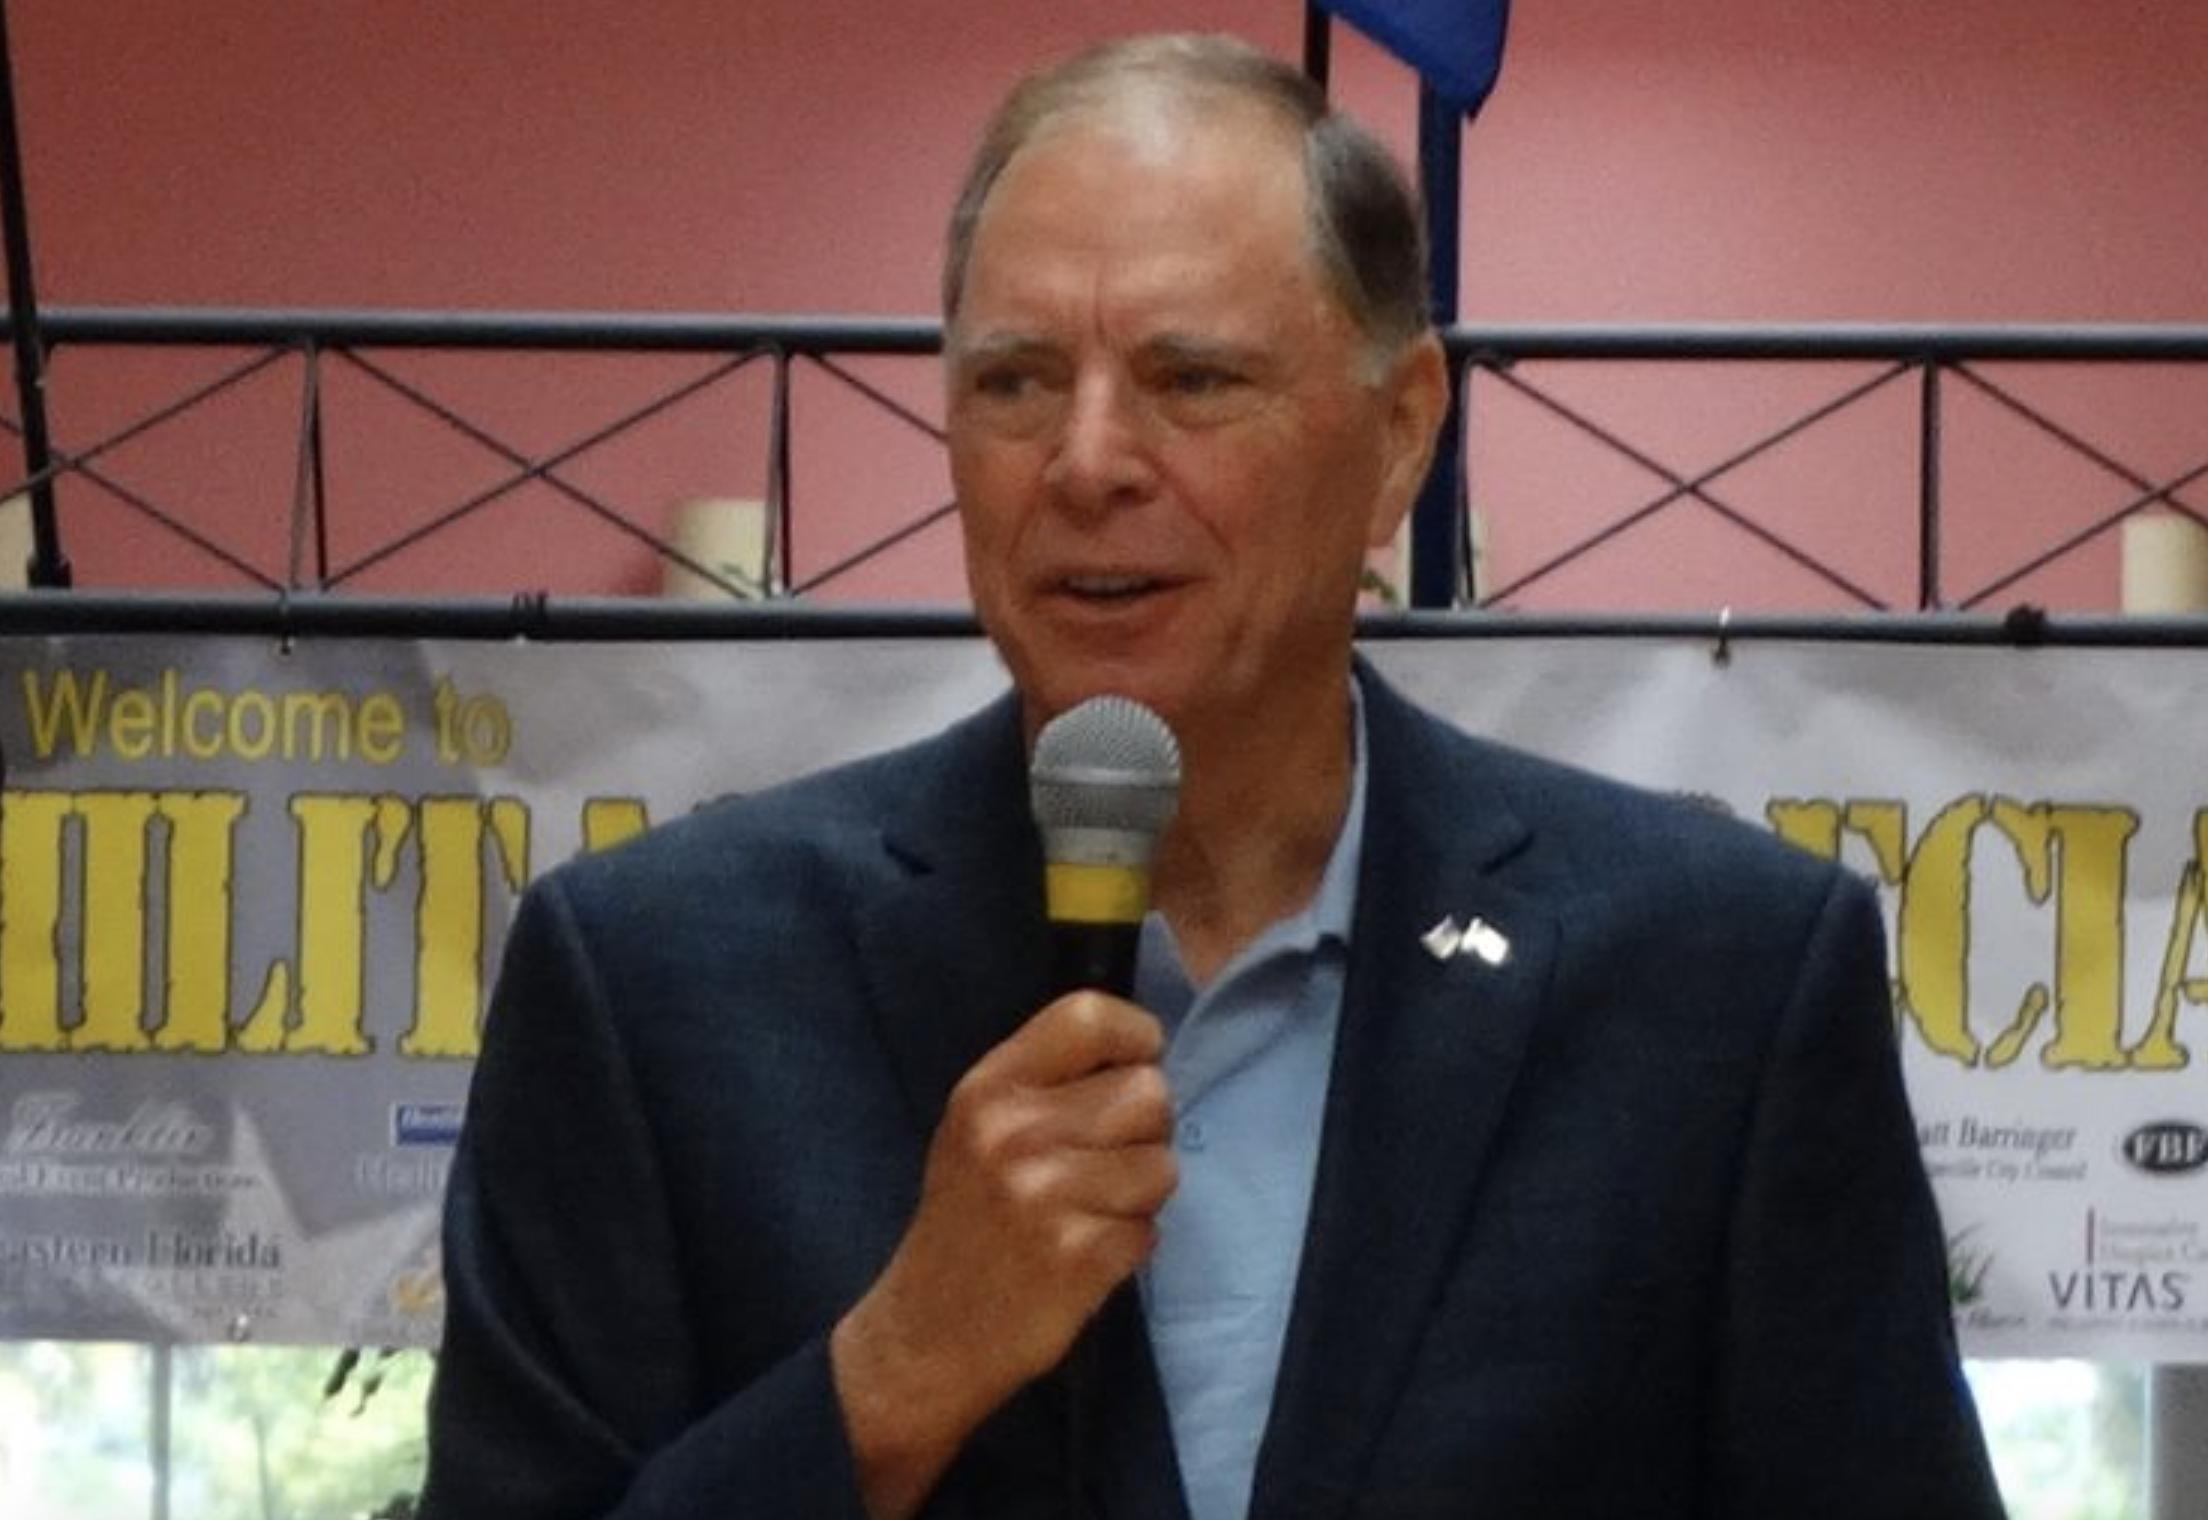 Posey wants DOJ investigation into 'massive voter fraud'